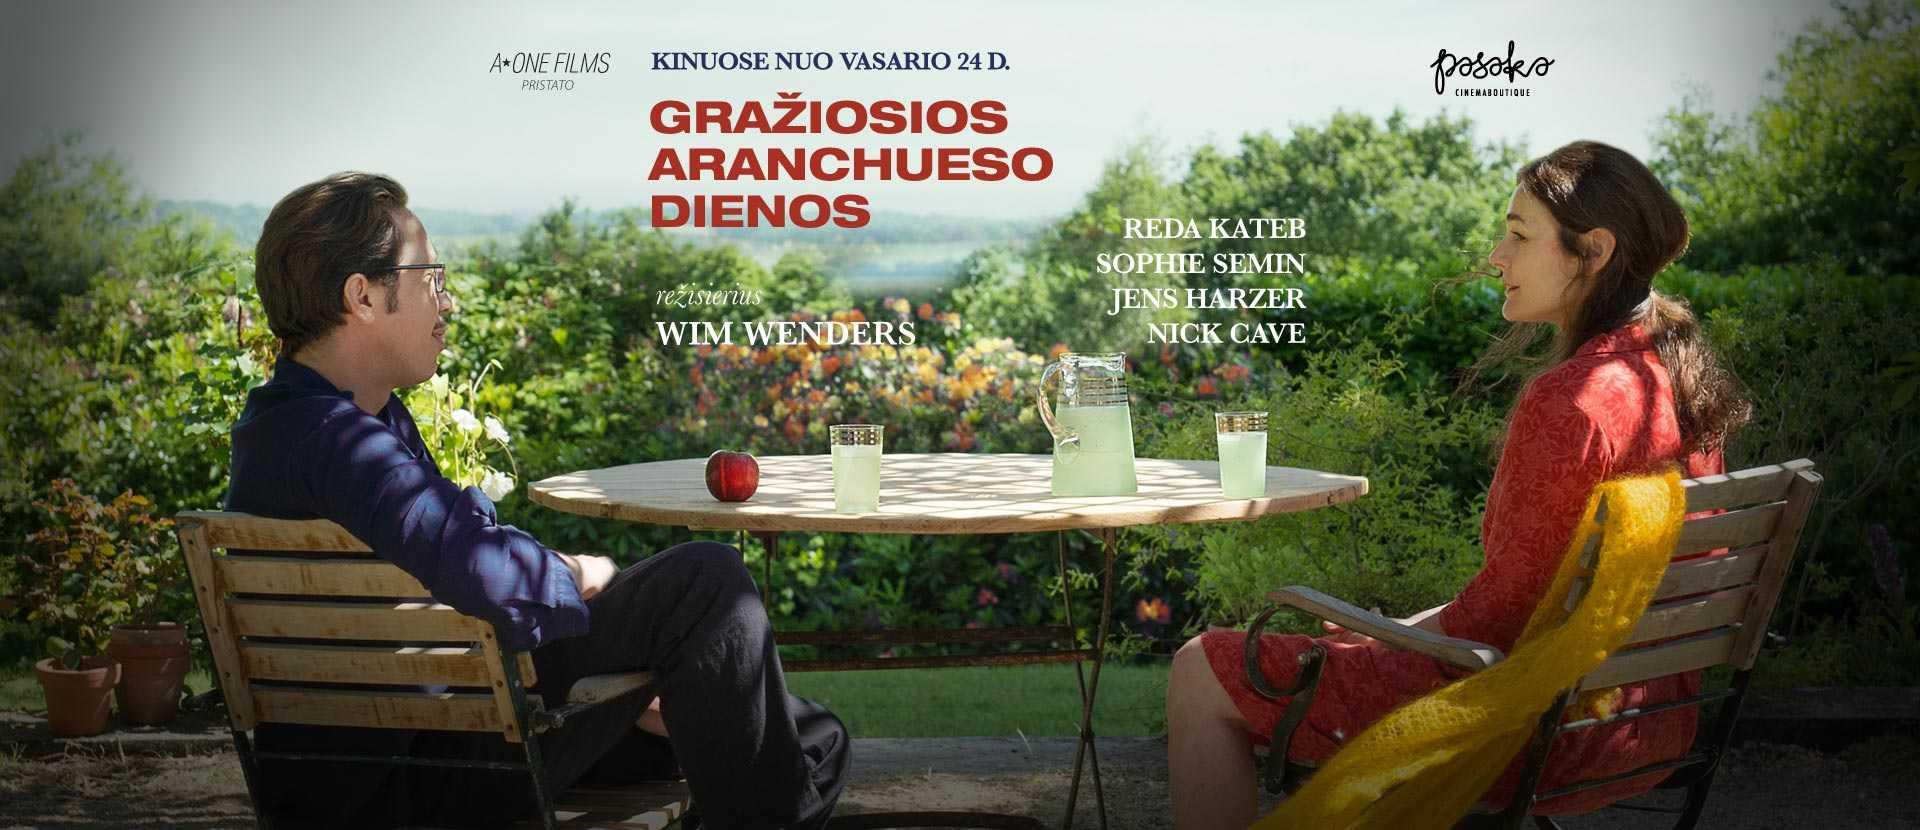 Gražiosios Aranchueso dienos